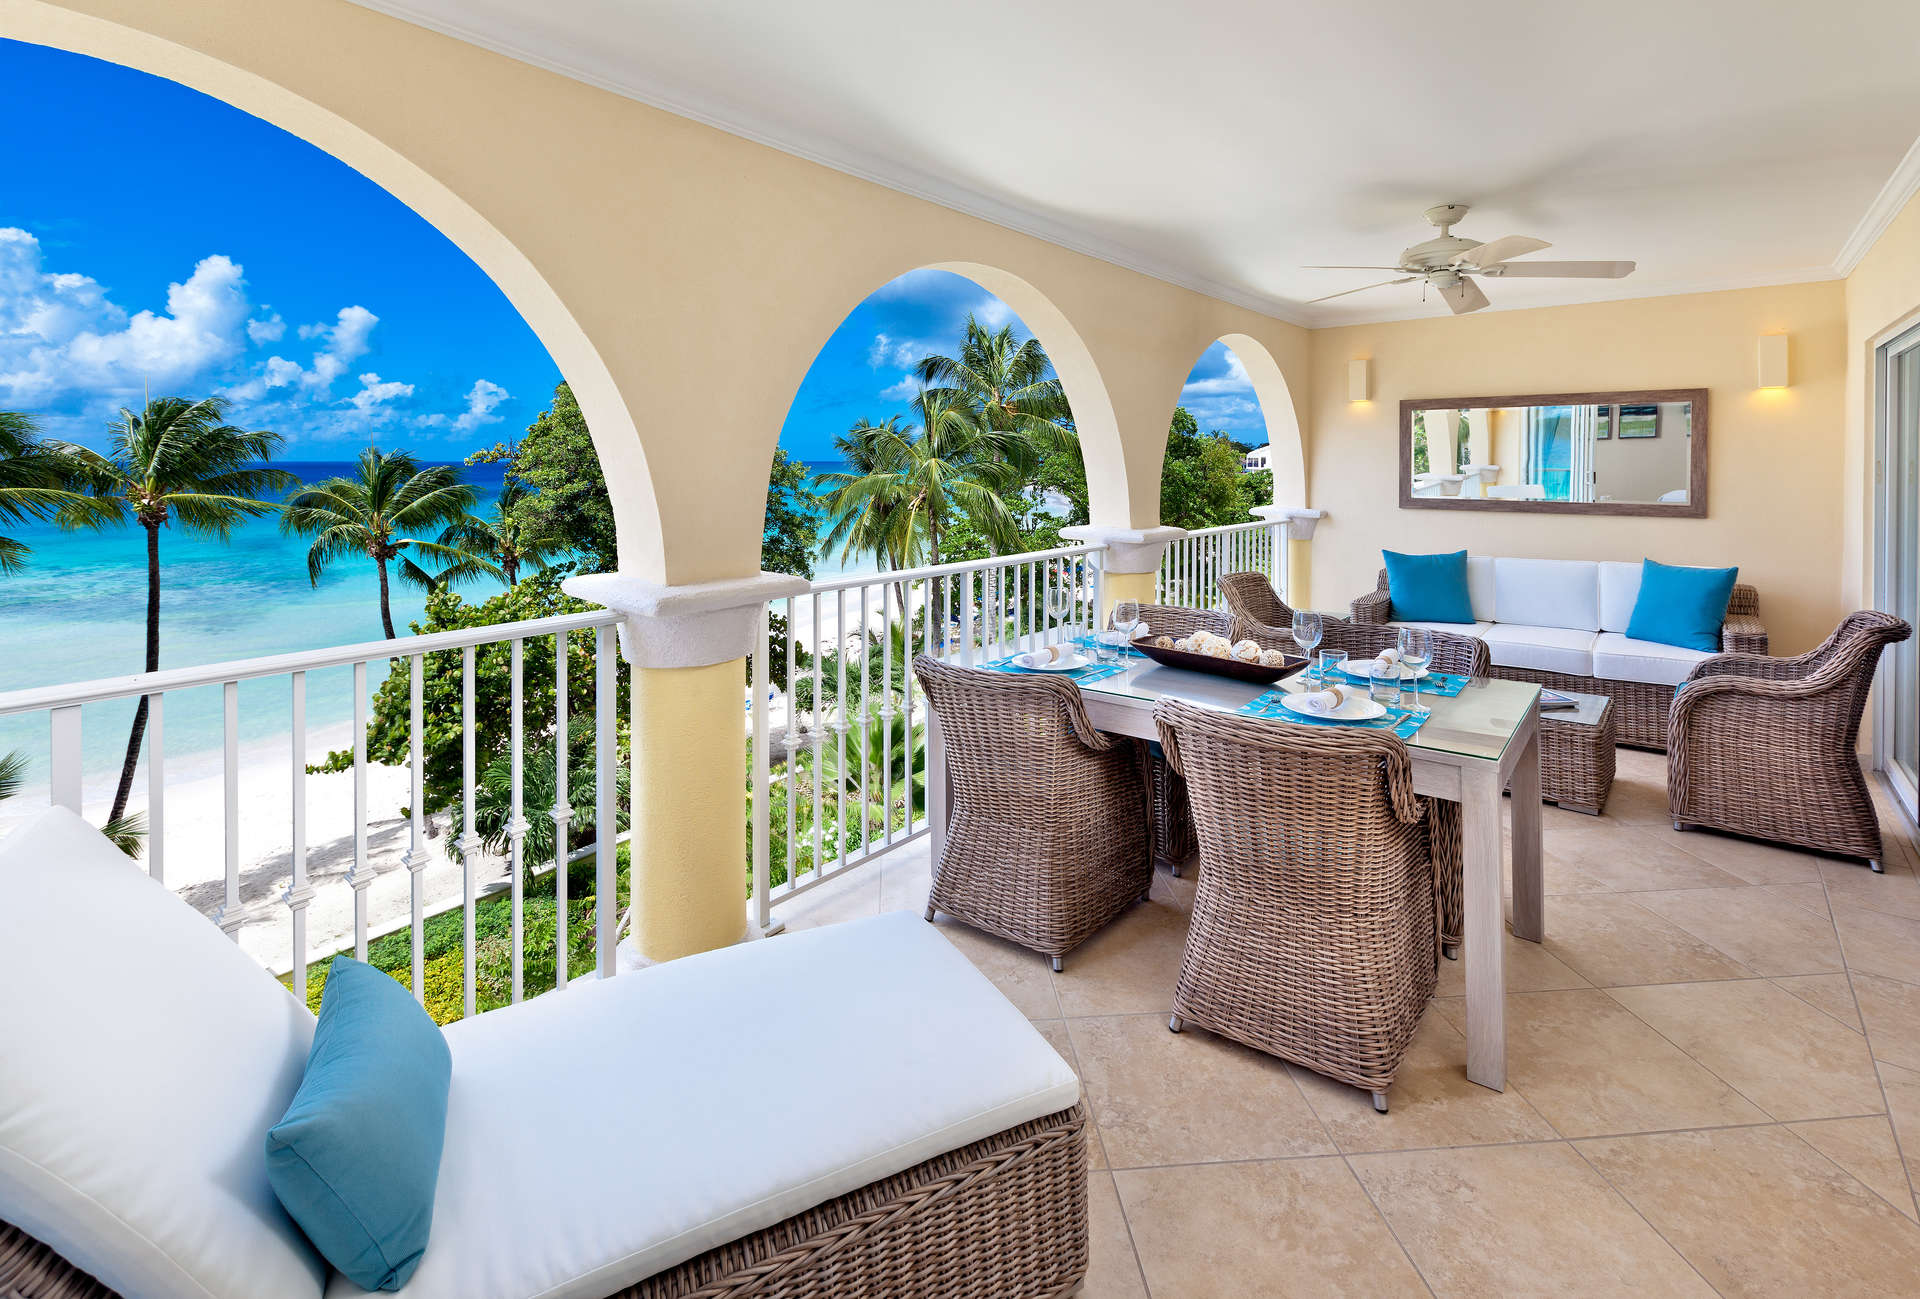 Luxury villa rentals caribbean - Barbados - Christ church - Oistins  - Sapphire Beach 317 - Image 1/8